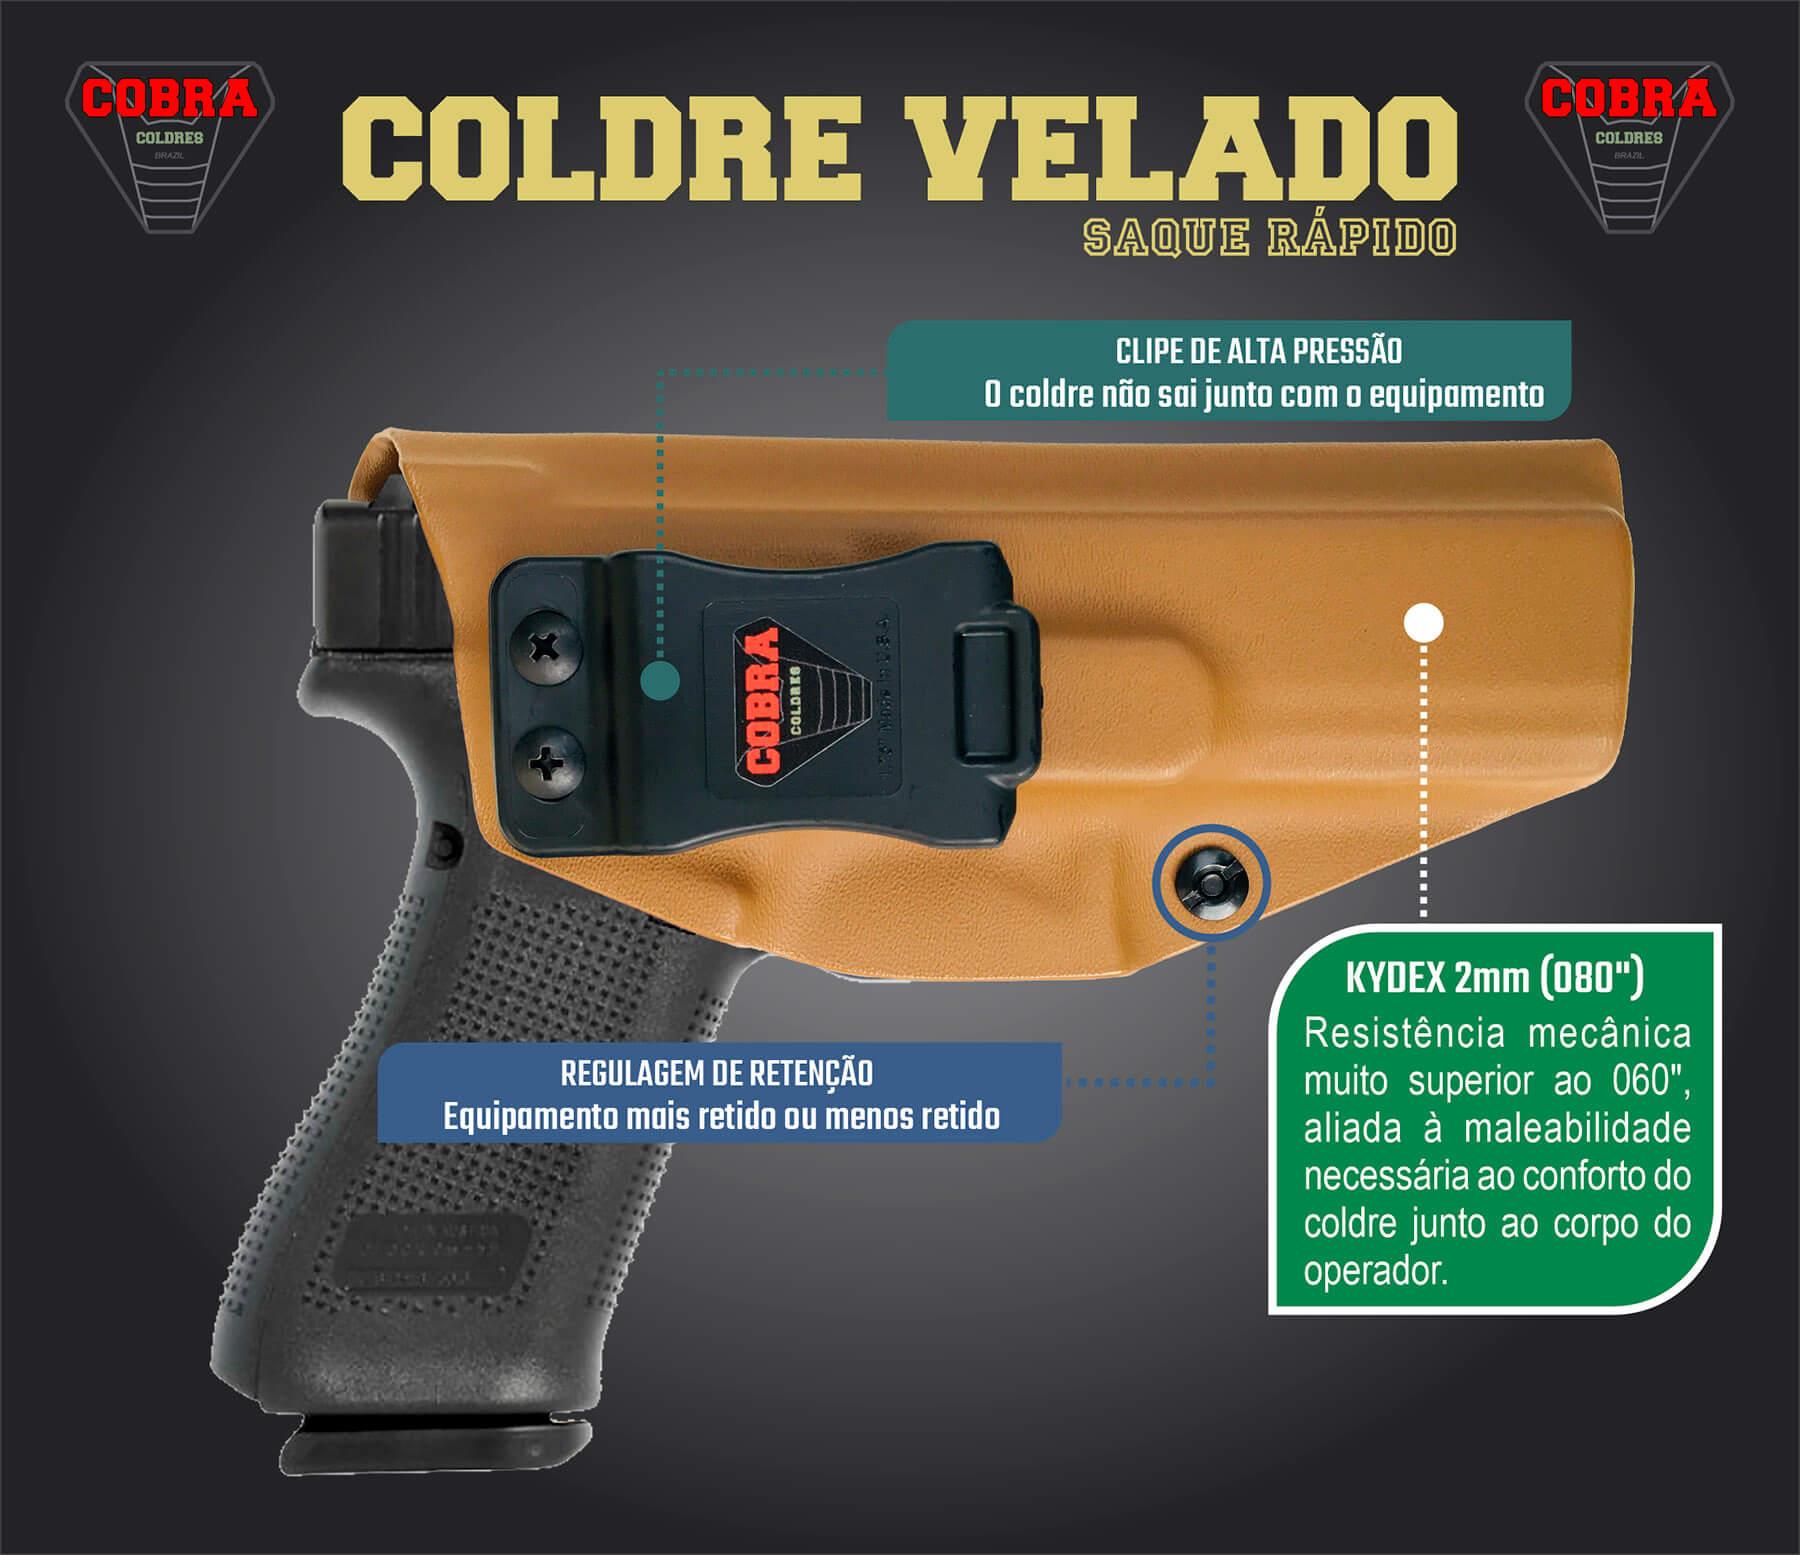 Coldre [TS9] [TS] Kydex + 2 Porta-Carregadores Universais - Saque Rápido Velado Kydex® 080